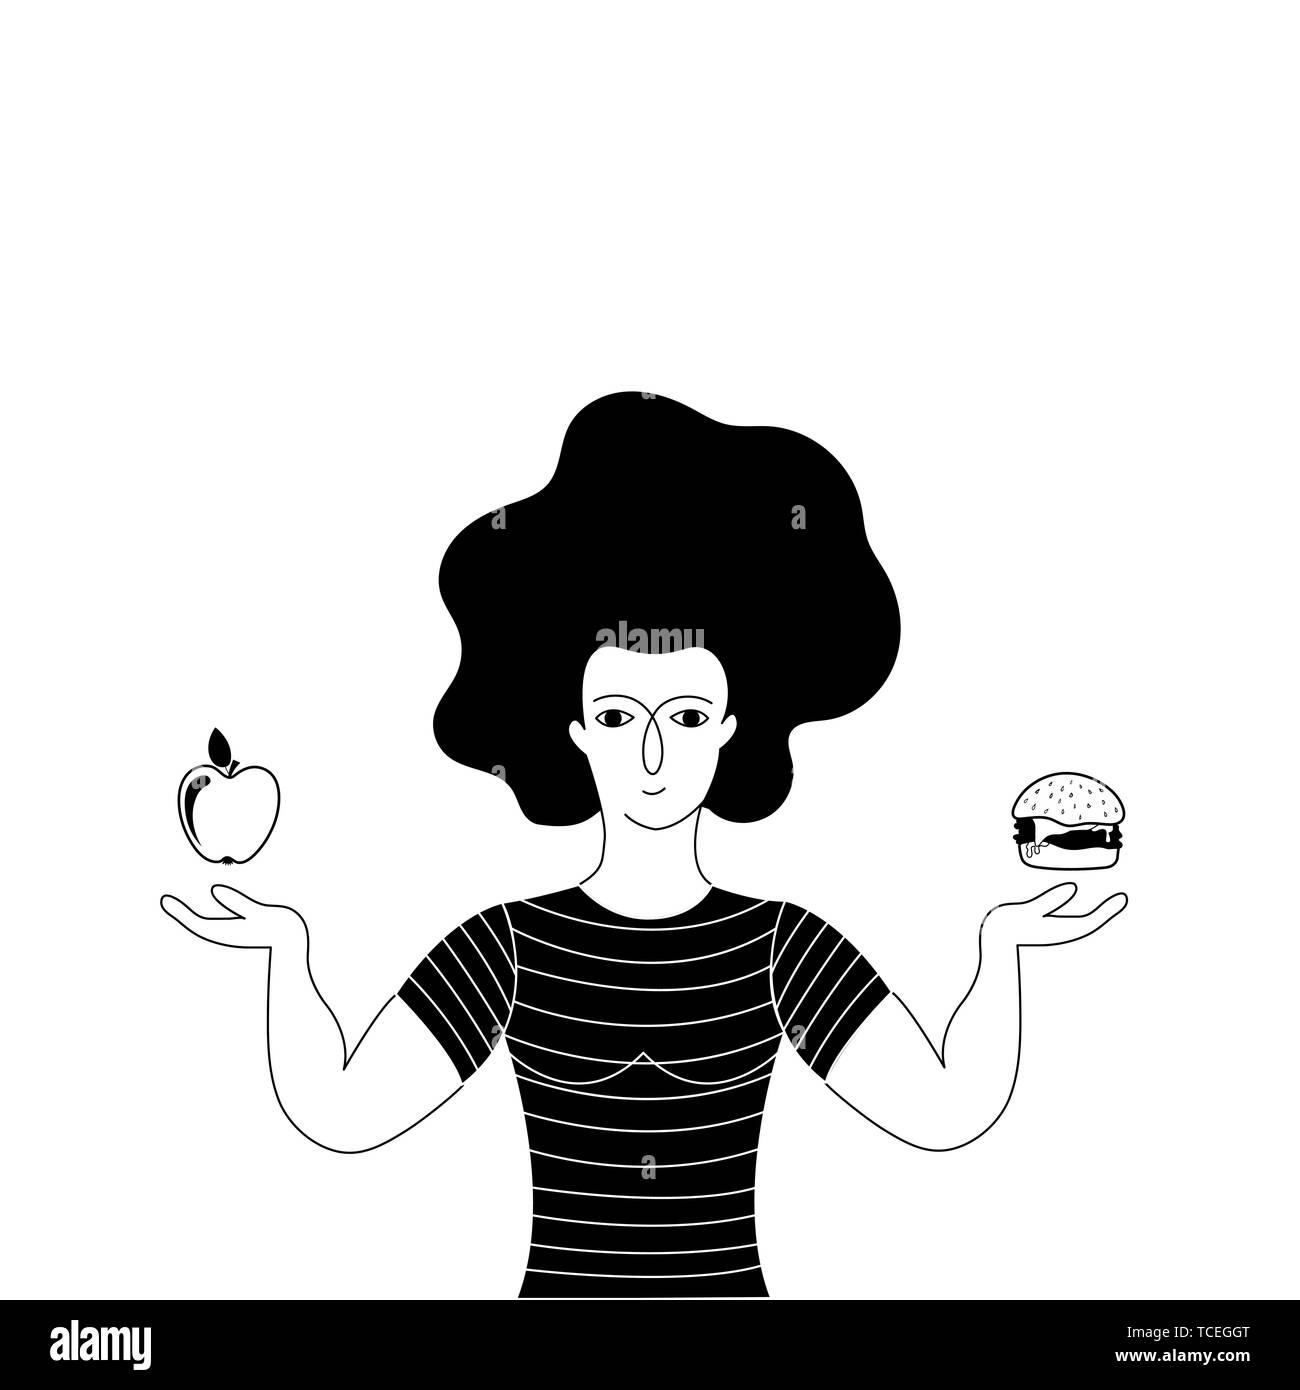 Woman chooses between a hamburger and an apple. Unhealthy vs healthy food. Hand drawn vector illustration. - Stock Image